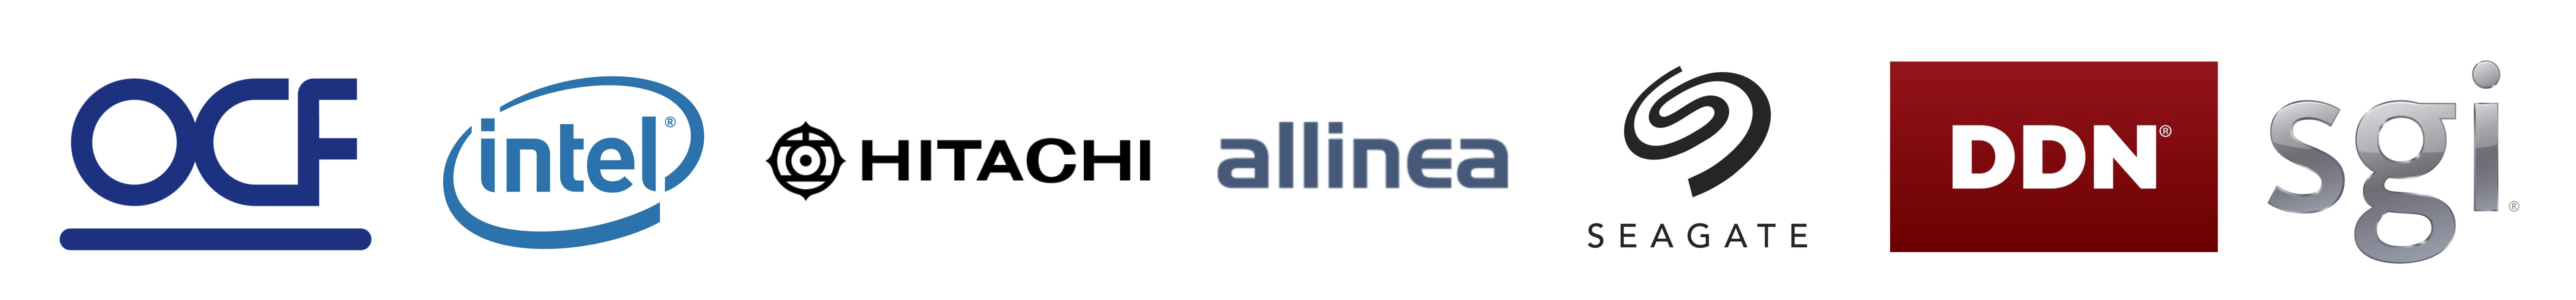 DiRAC Science Day sponsors: OCF, Intel, Hitachi, Allinea, Seagate, DataDirect Networks